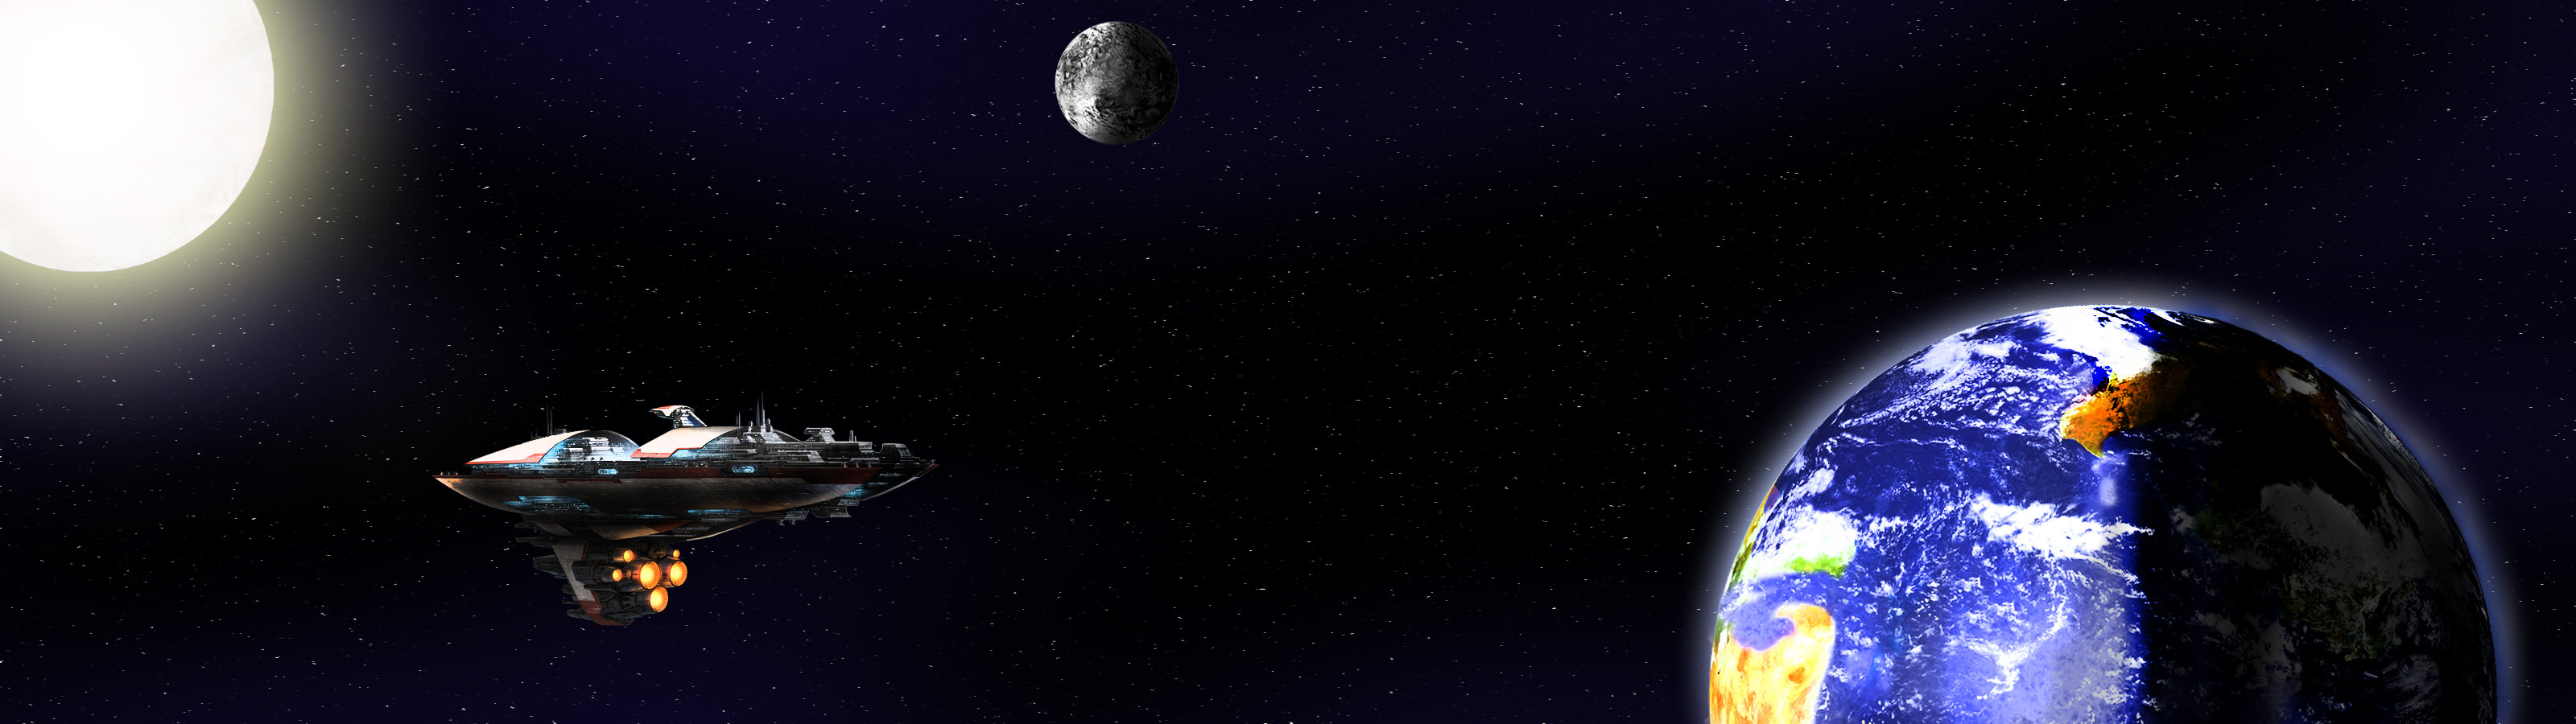 Art Space Dual Screen Light Earth Planets Black Hole Desktop 2416x900 3200x900